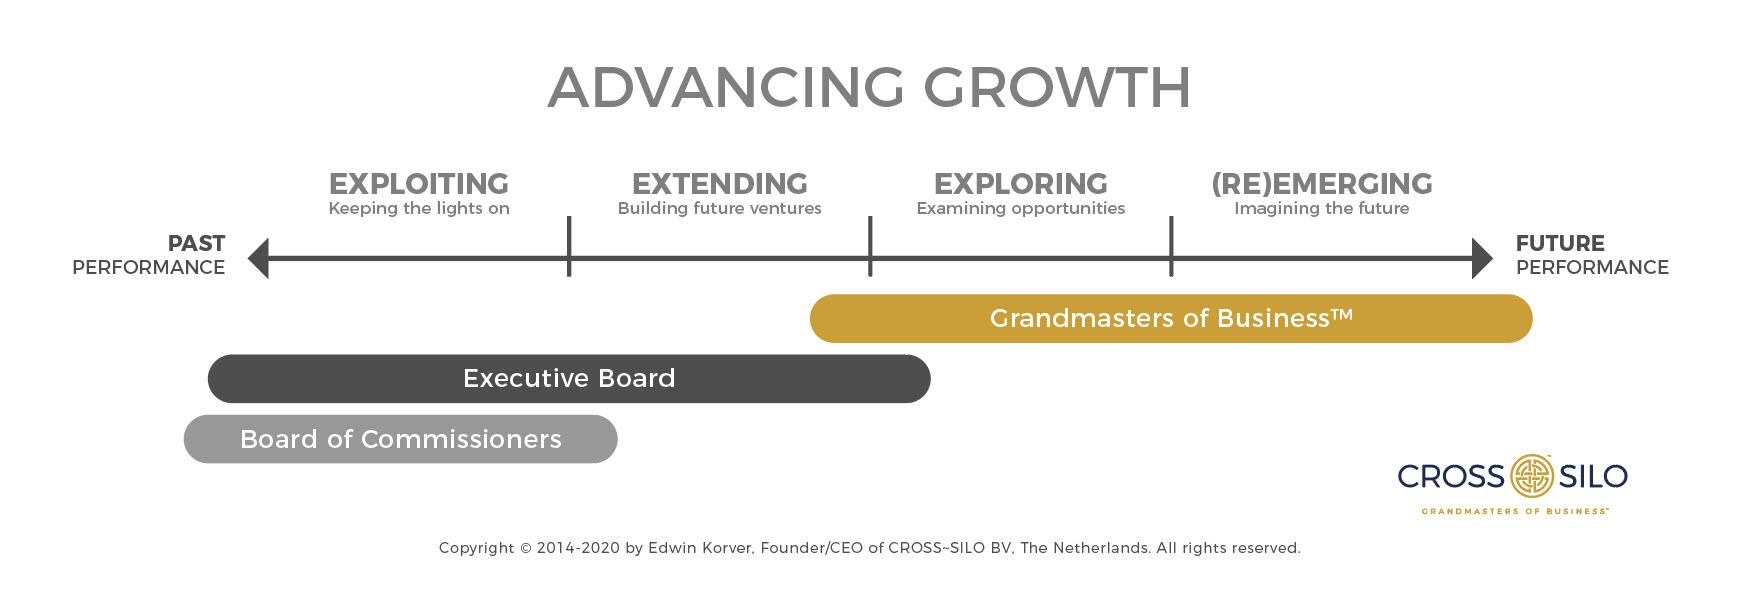 CROSS-SILO_Advancing_Growth